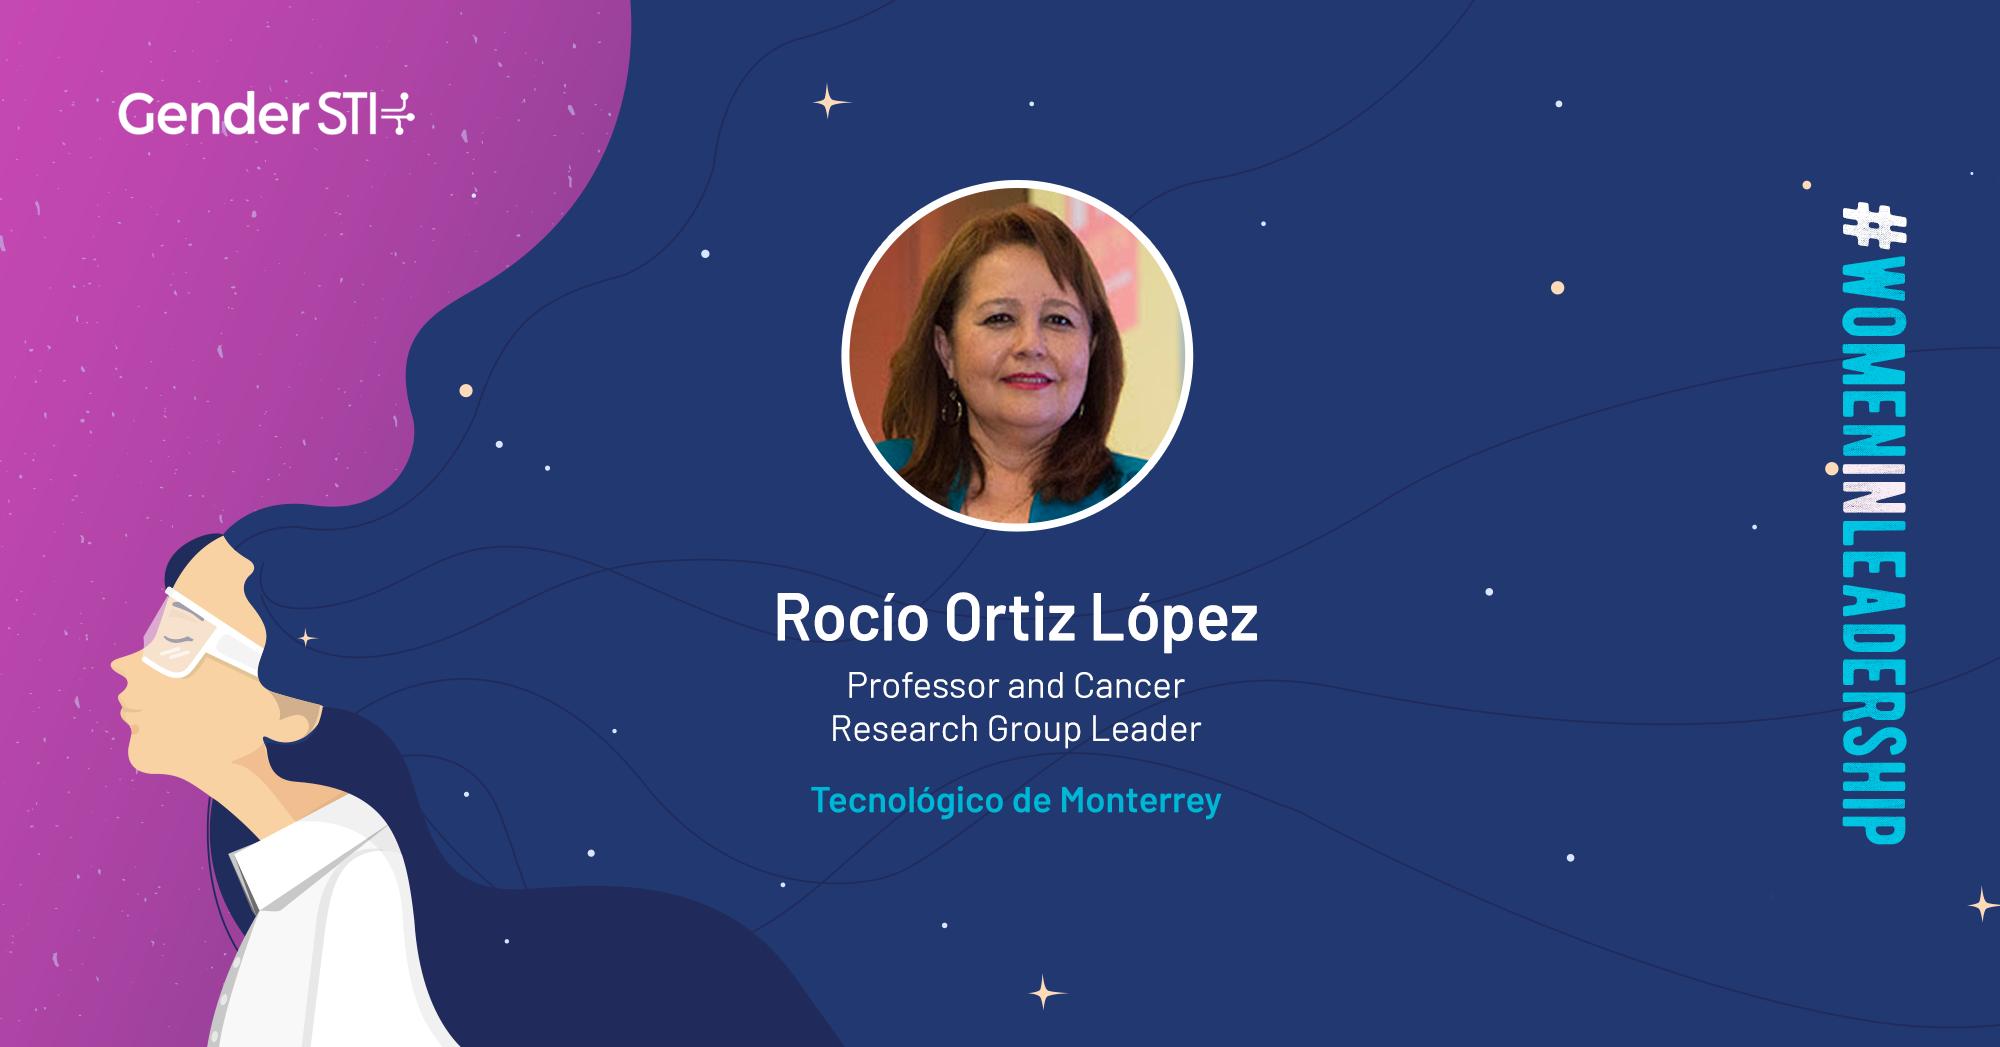 Rocío Ortiz López, a professor at Tec de Monterrey, is one of Gender STI's #WomenInLeadership nominees.